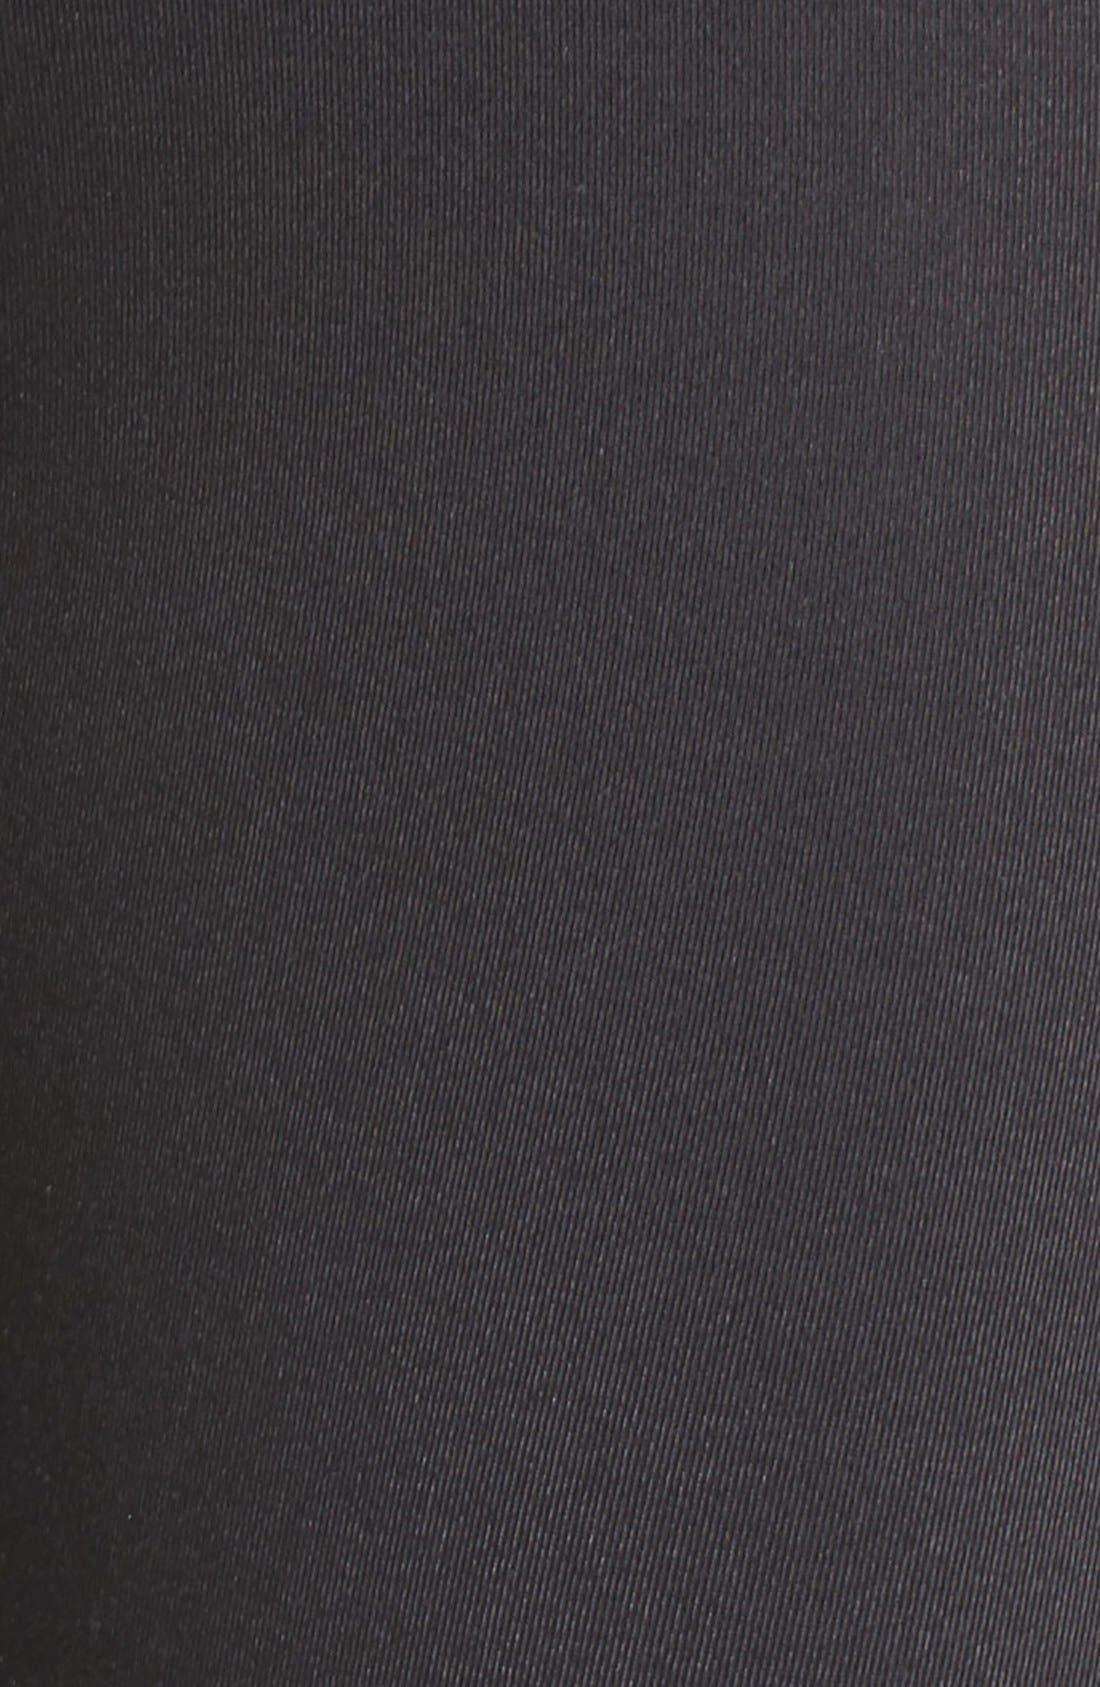 'Airbrushed' Leggings,                             Alternate thumbnail 171, color,